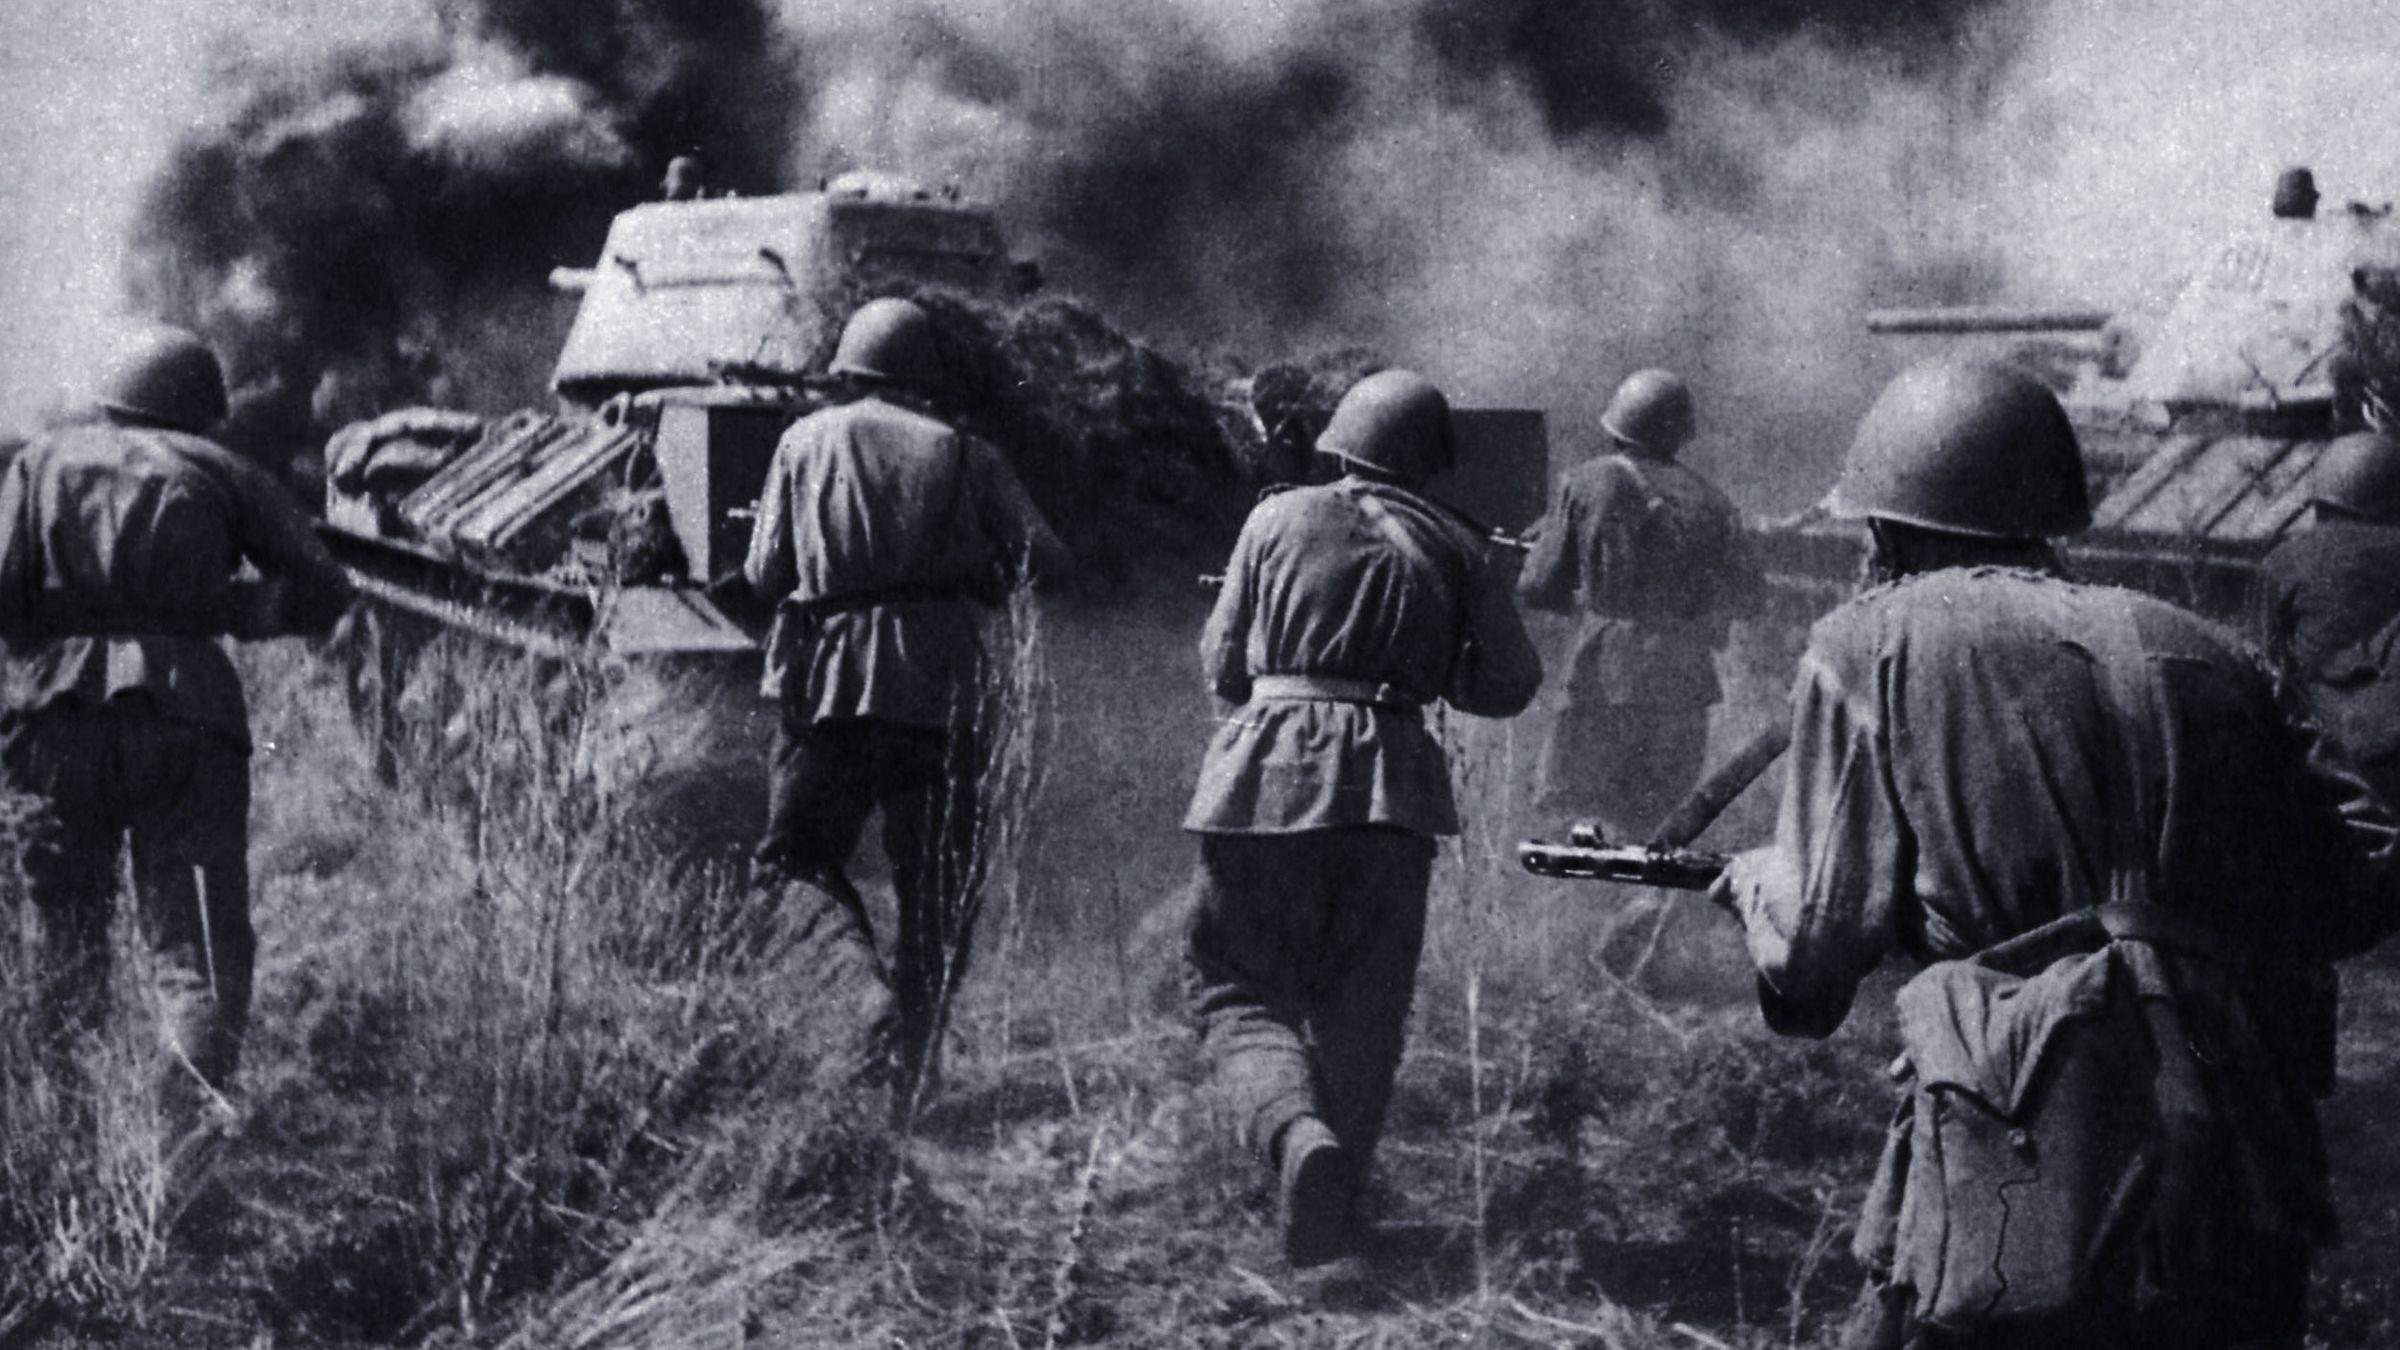 "<p>Фото © <a href=""http://mil.ru/winner_may/history/more.htm?id=11795520@cmsArticle"" target=""_blank"" rel=""noopener noreferrer"">Министерство обороны</a></p>"